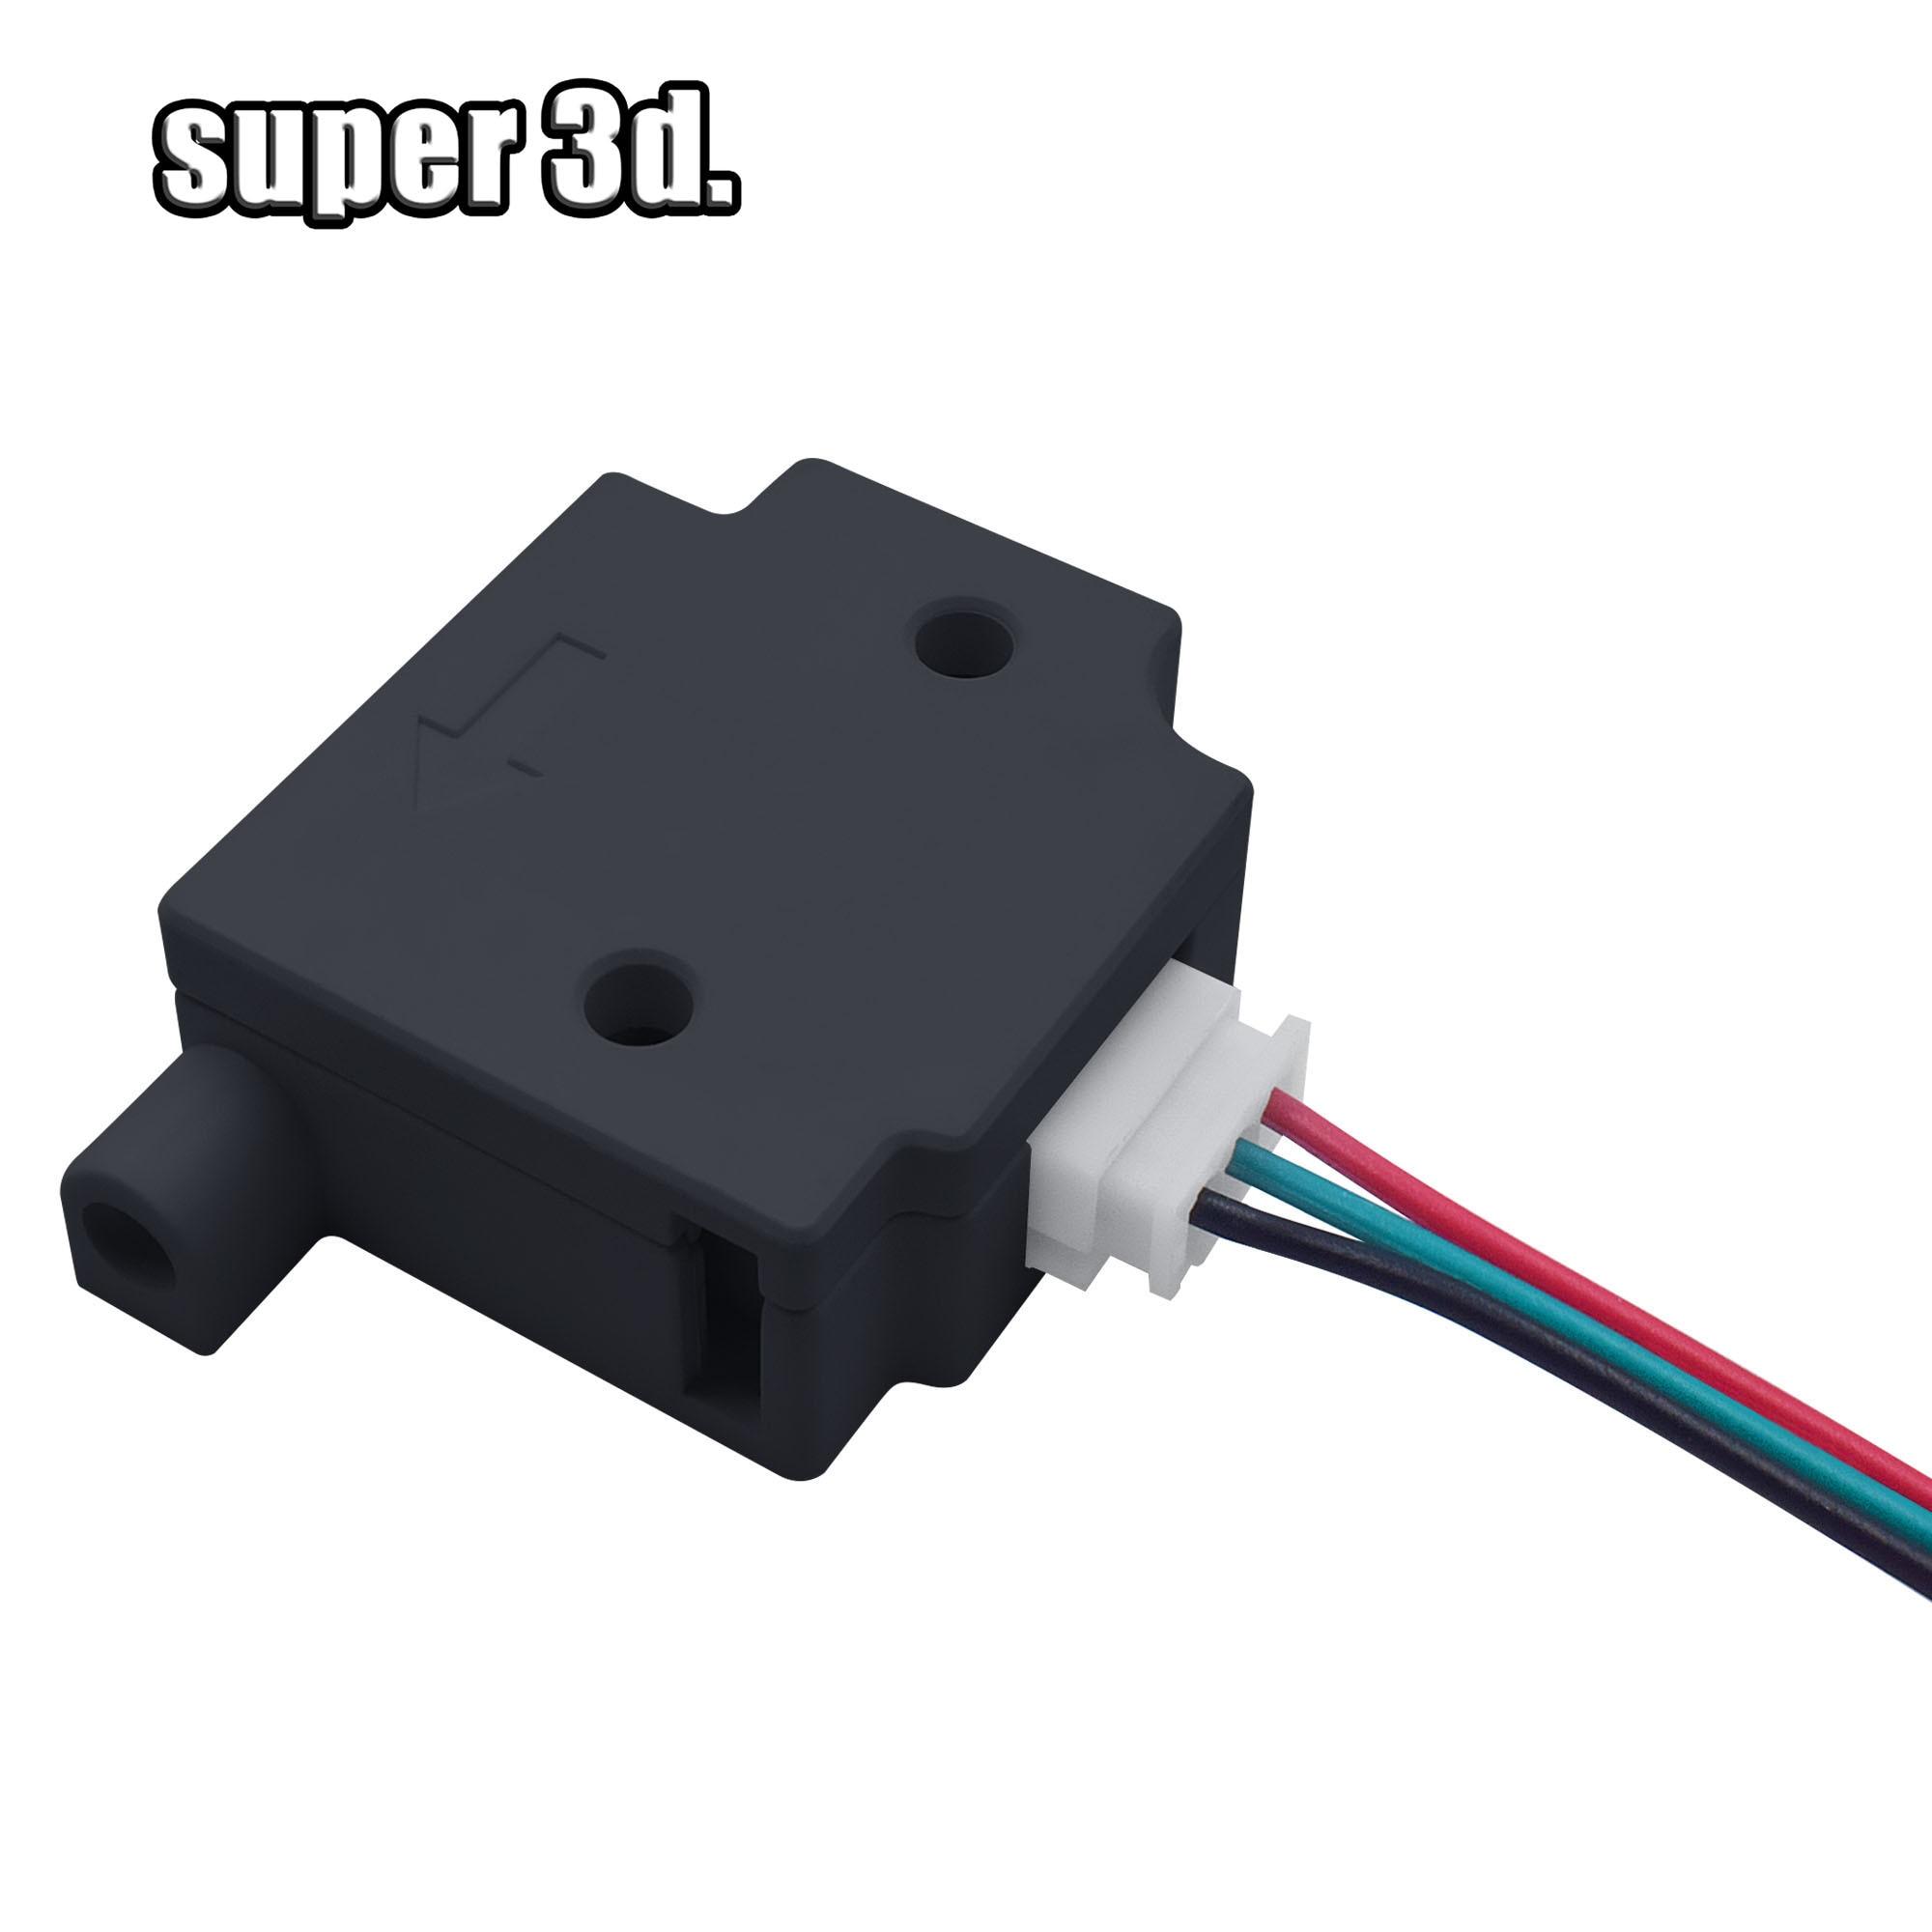 3D Printer Filament Break Detection Module With 1M Cable Run-out Sensor Material Runout Detector